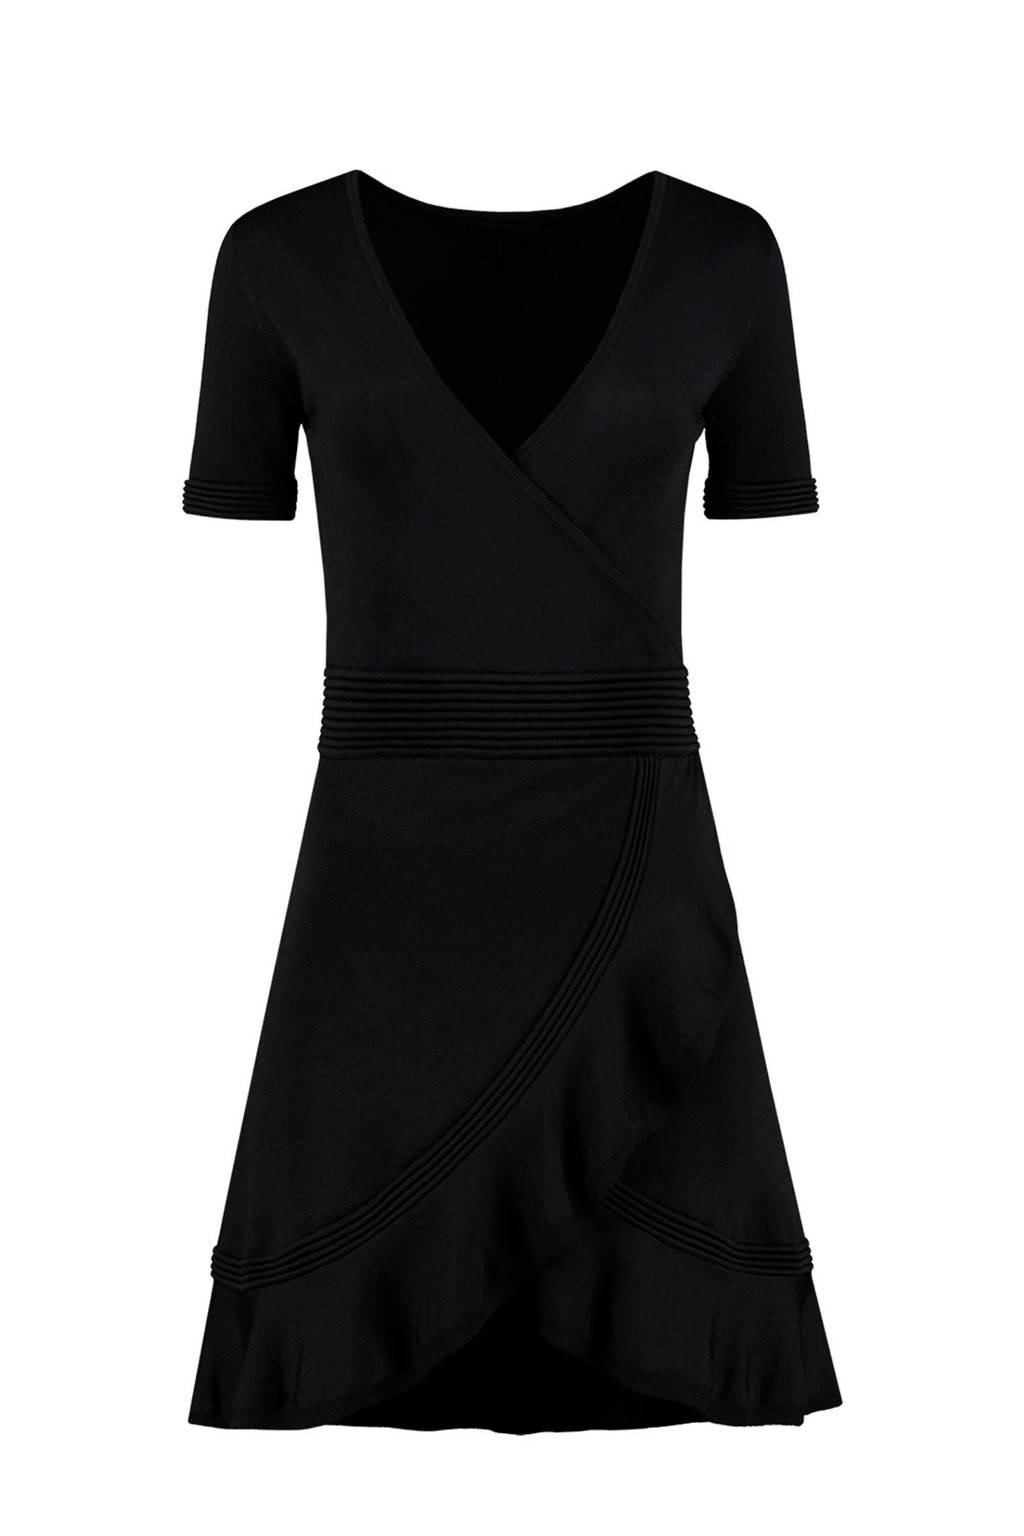 NIKKIE Jori jurk met ruches zwart, Zwart